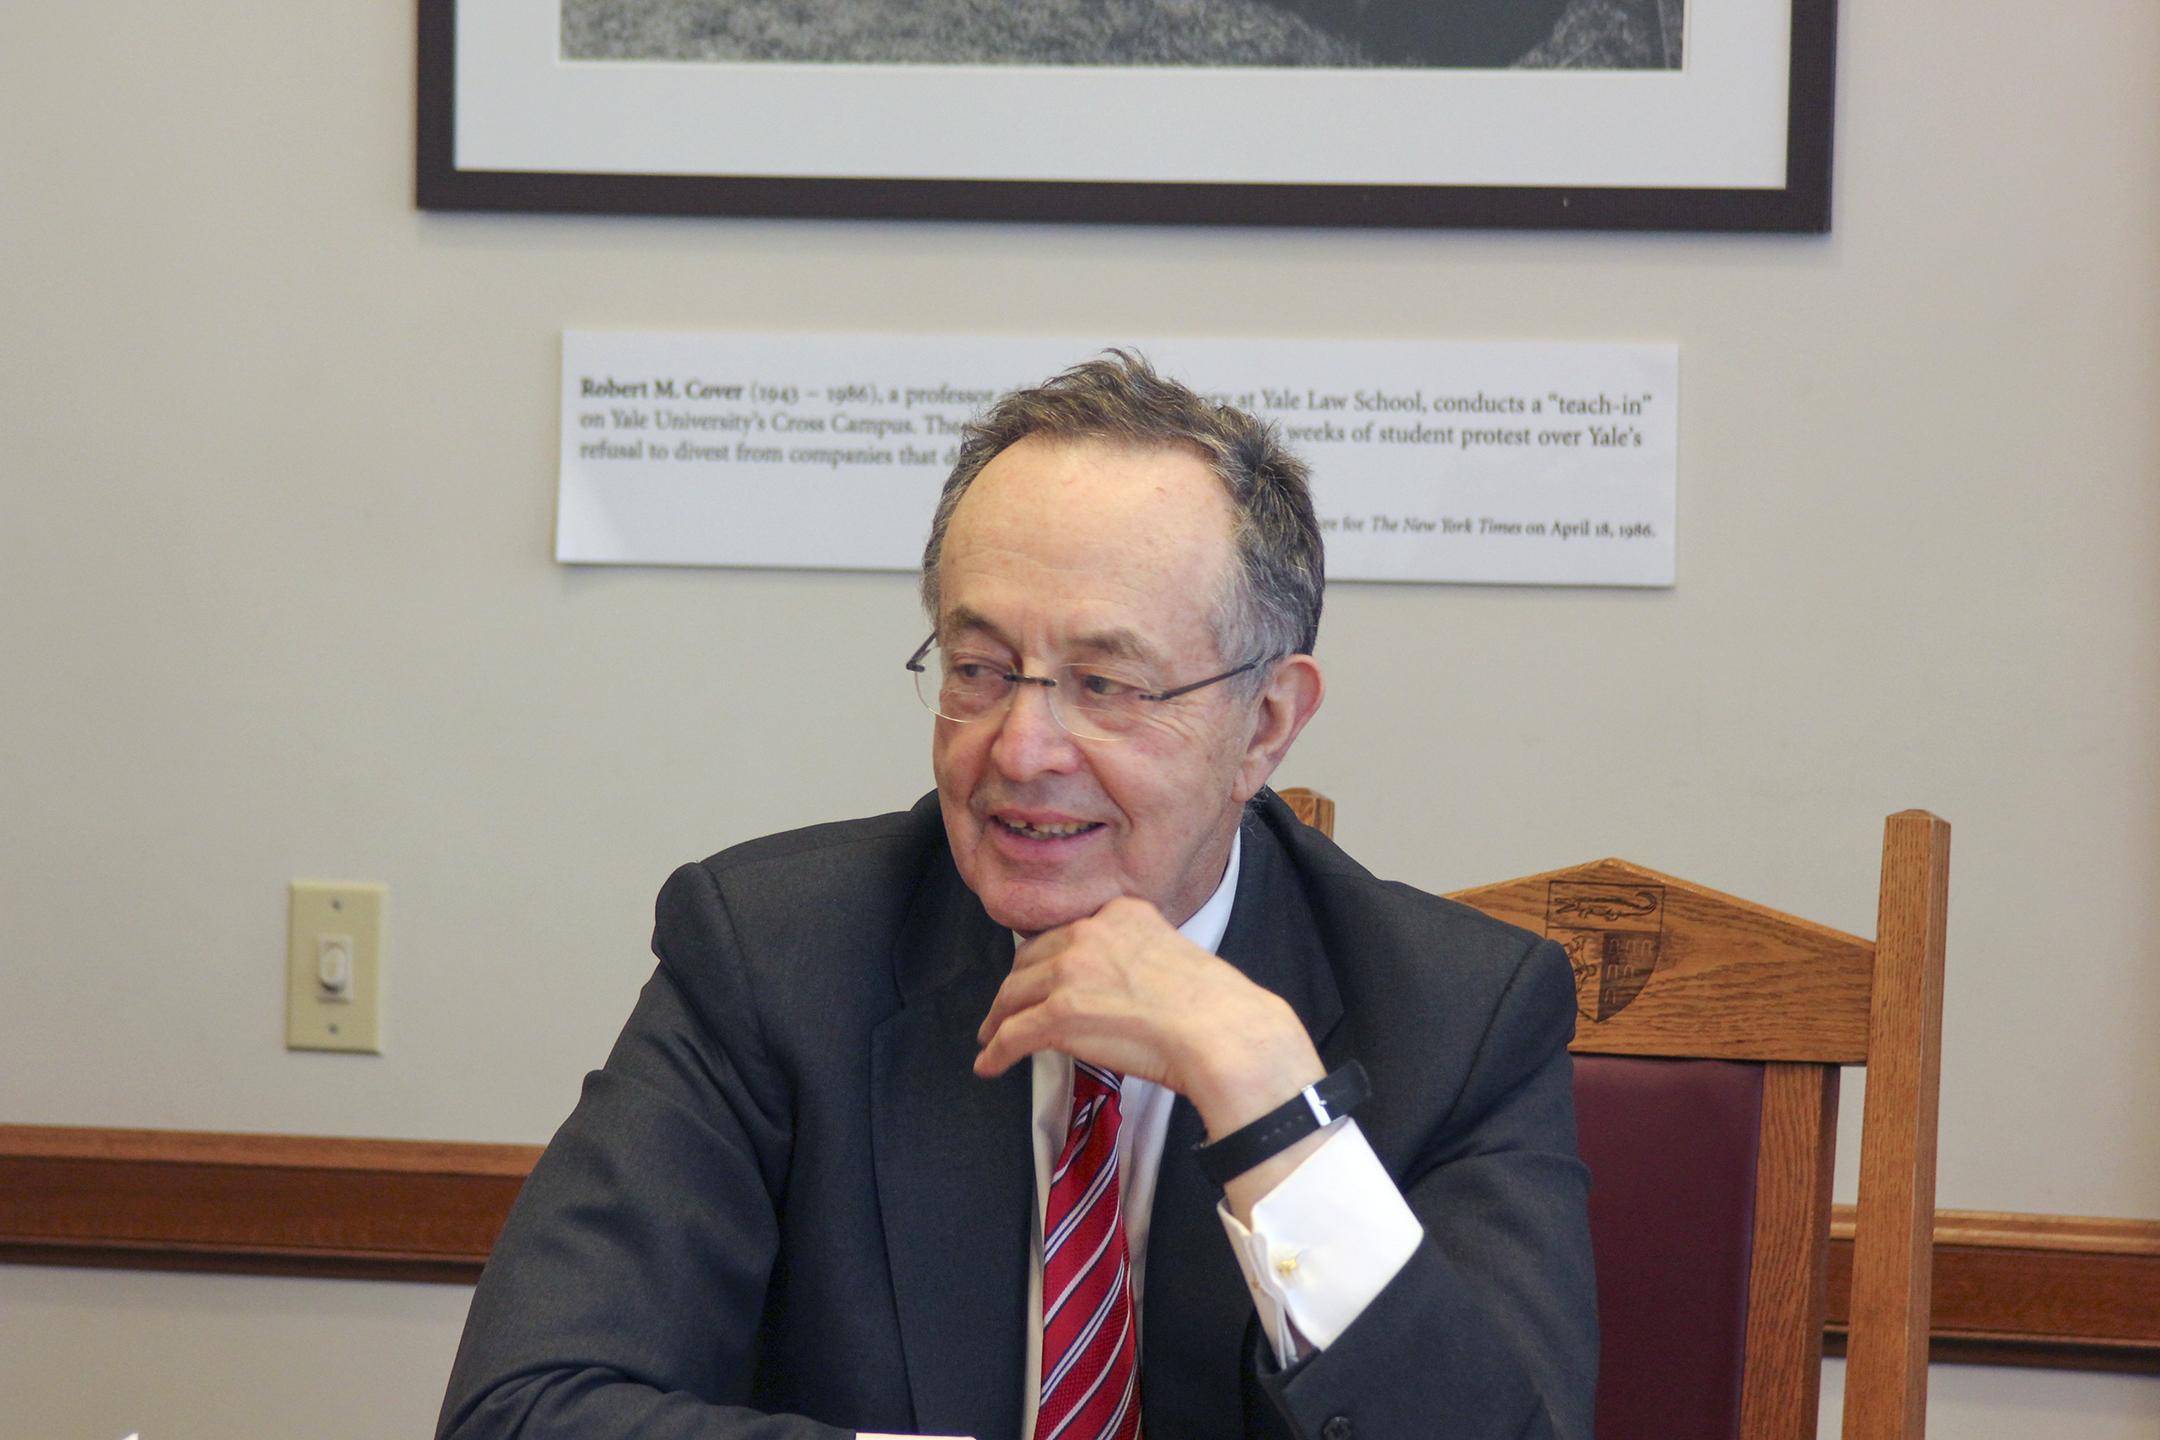 John A. Levin '63